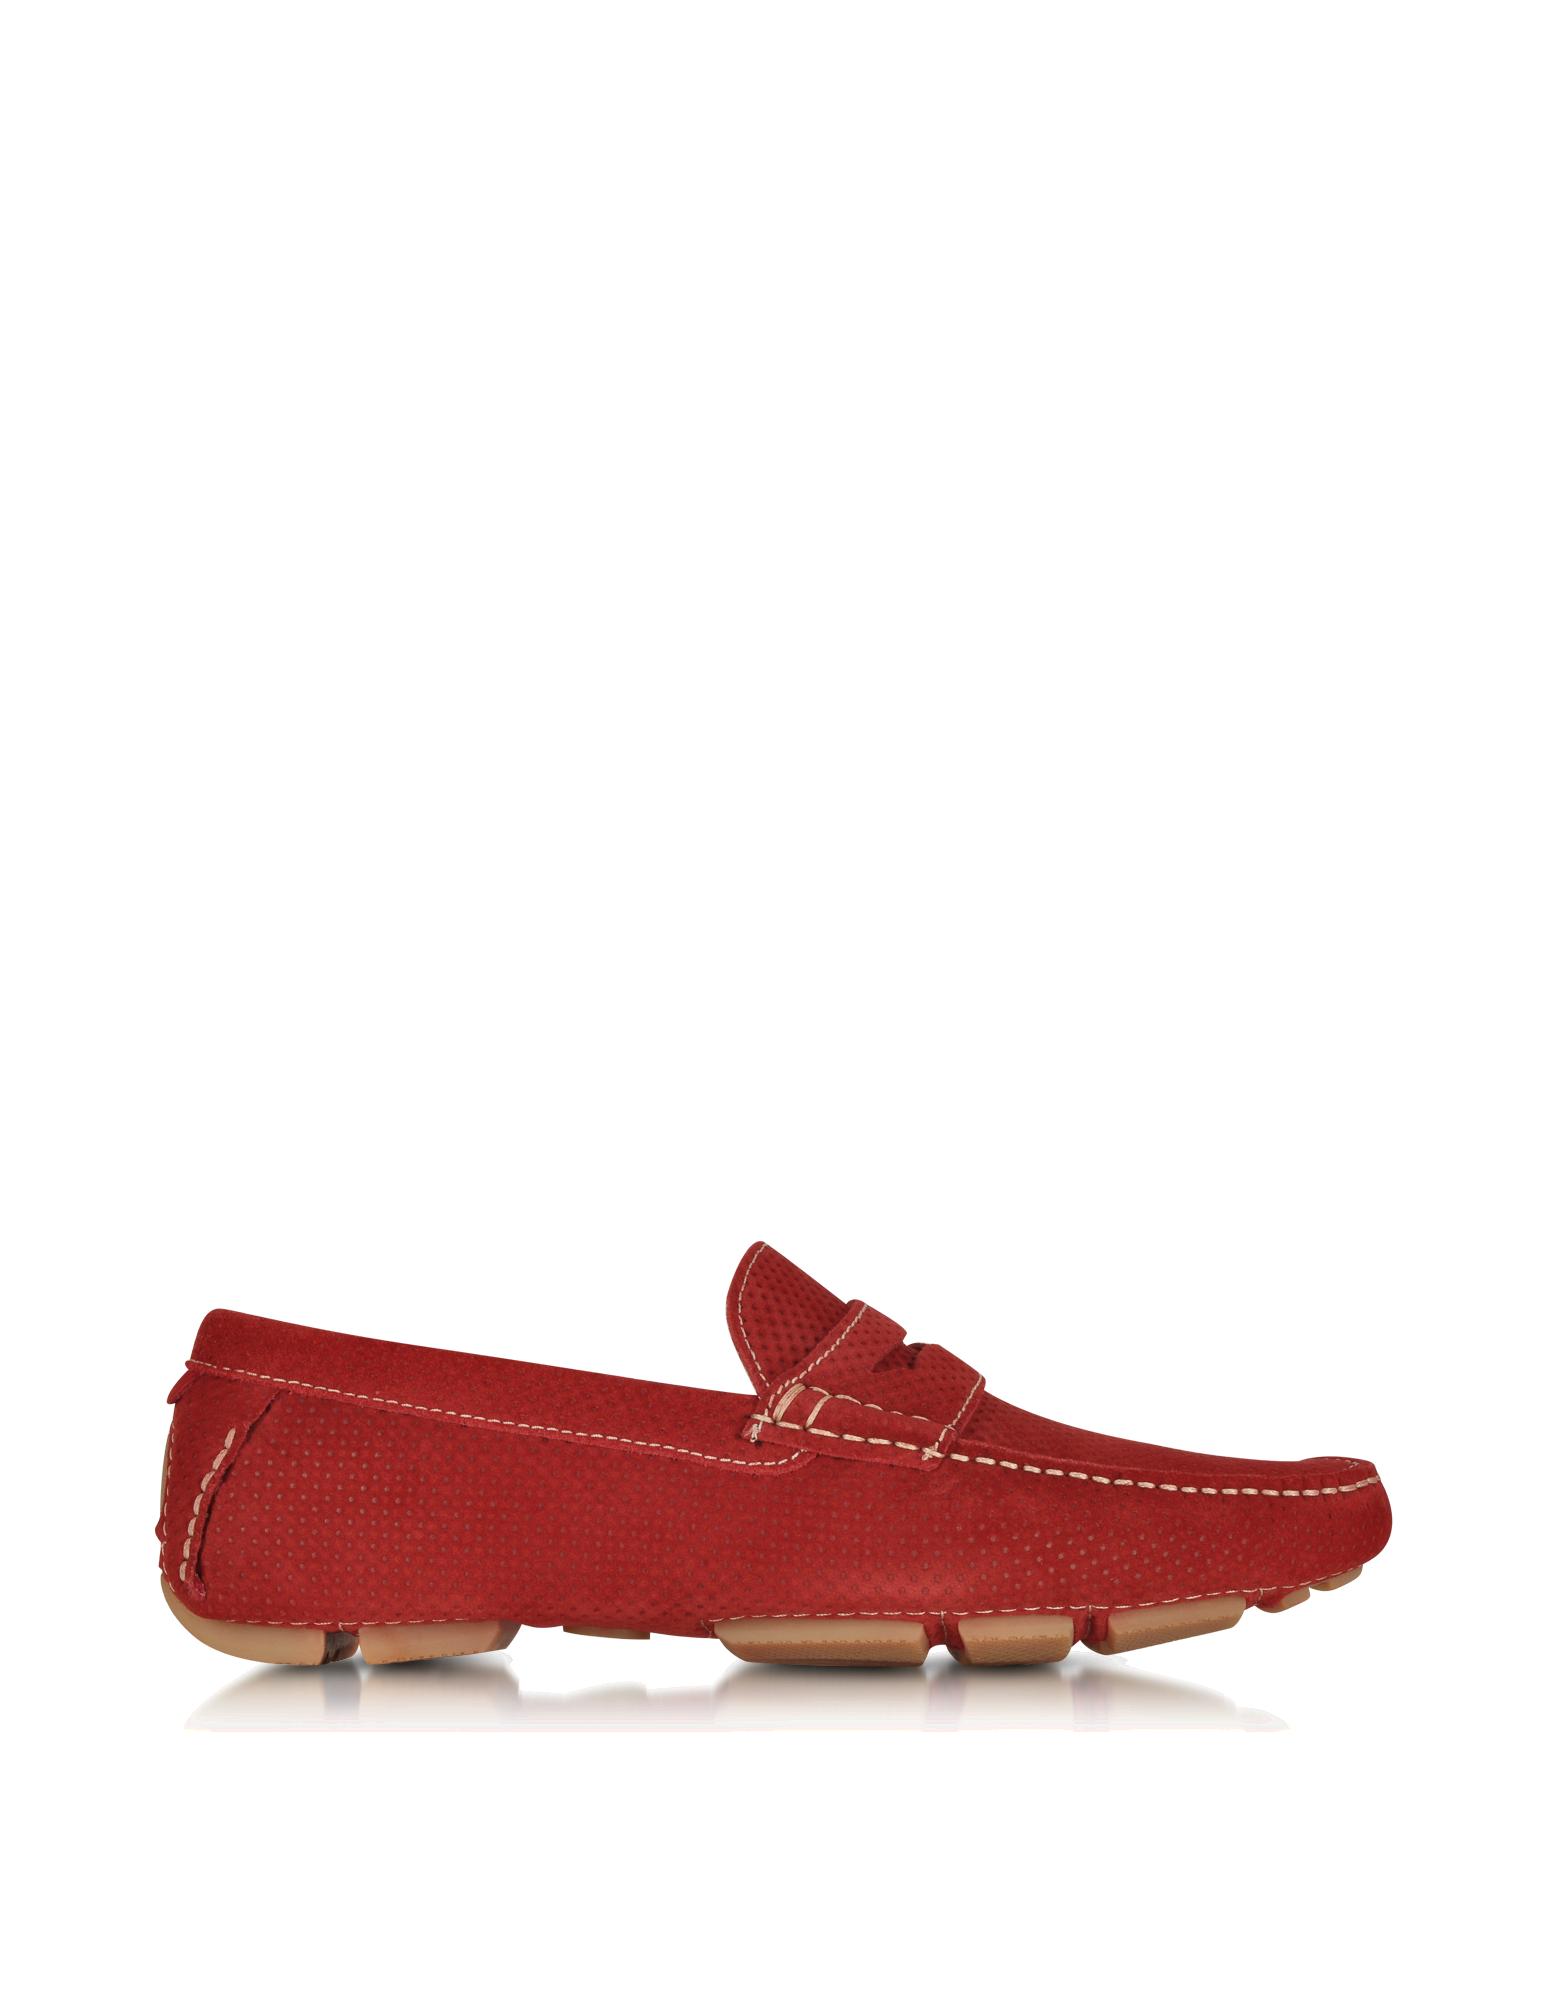 Image of Garofano Techno Suede Moccasin Shoe